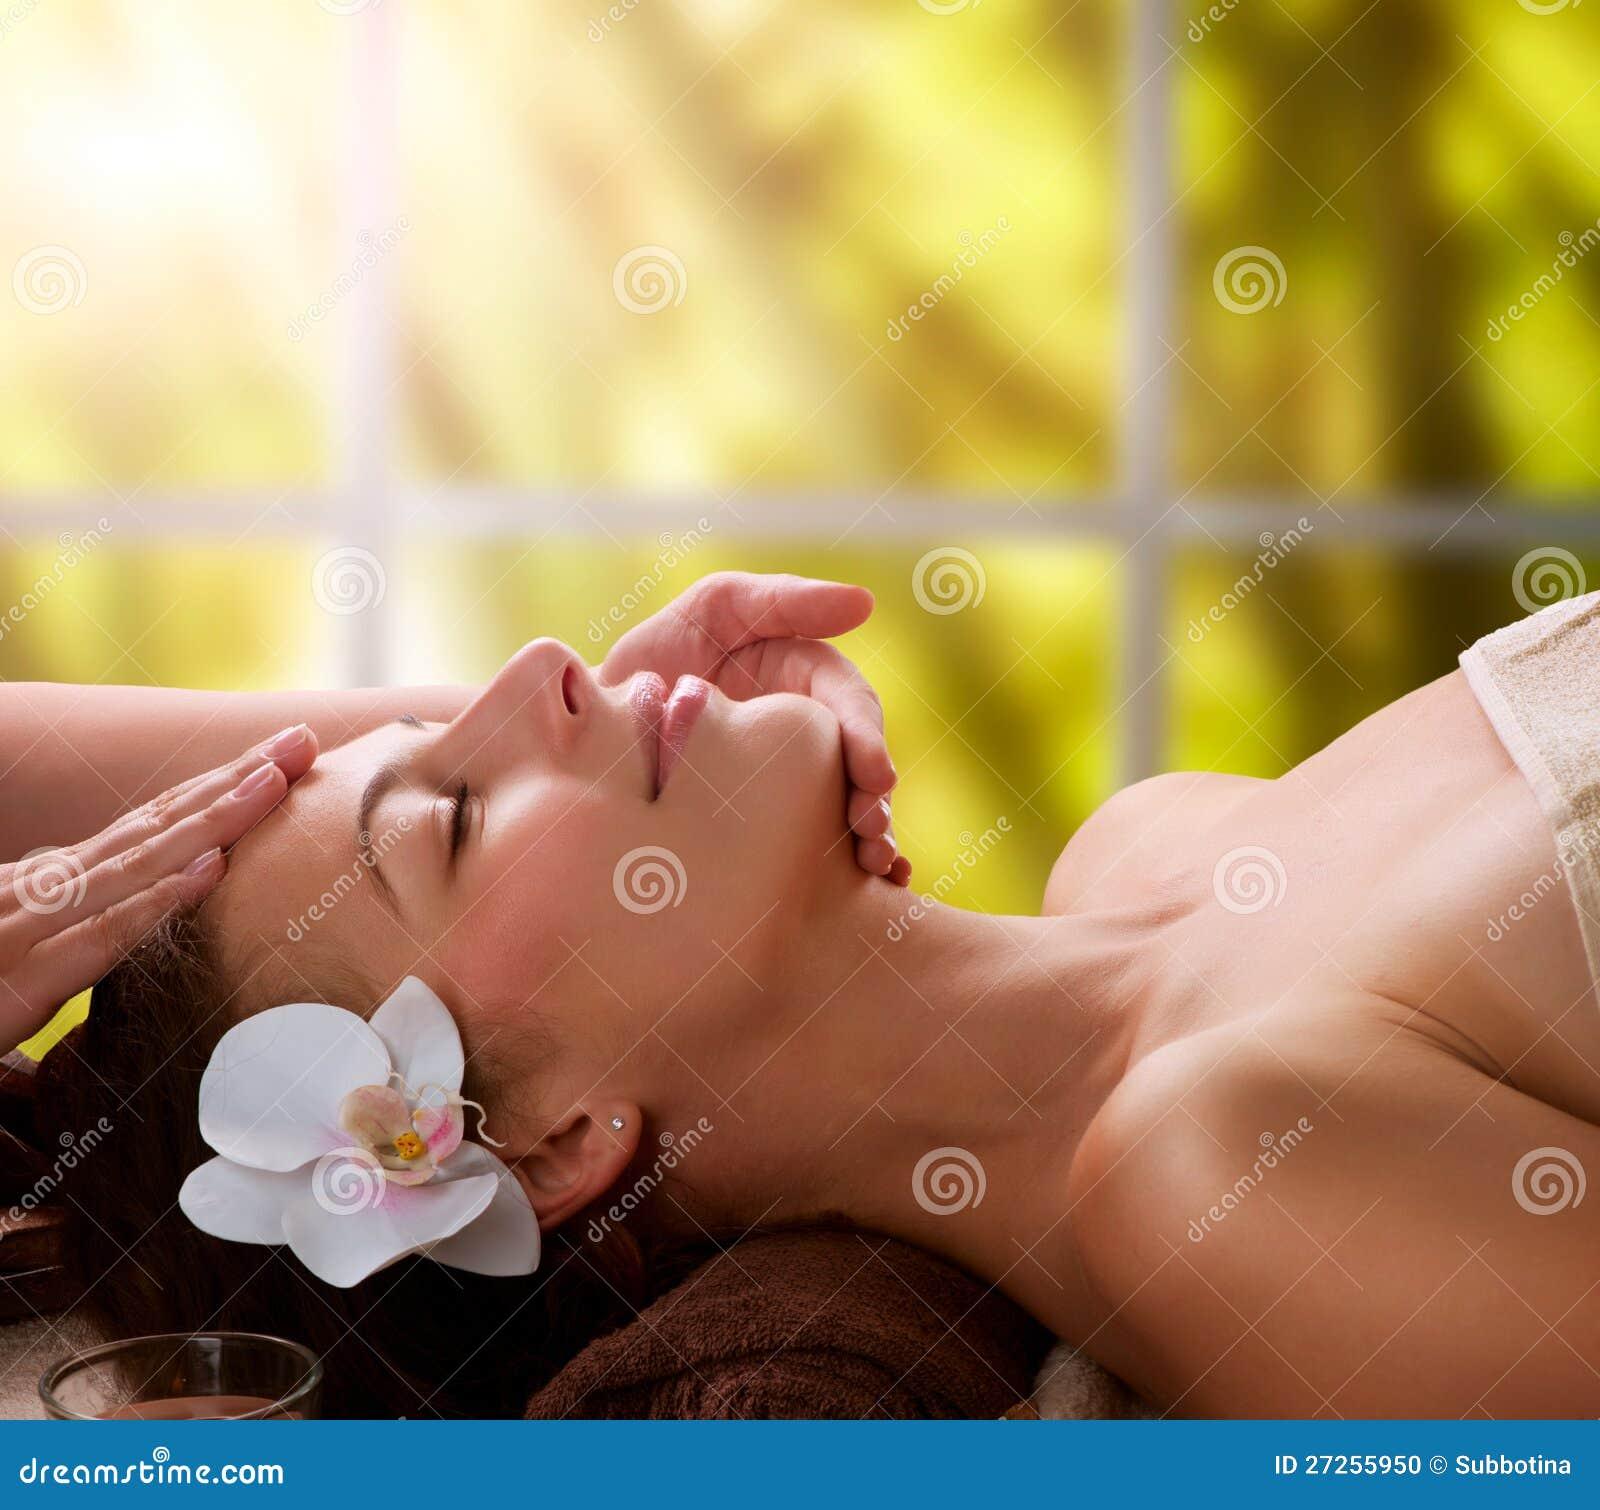 free x videos smile thai massage